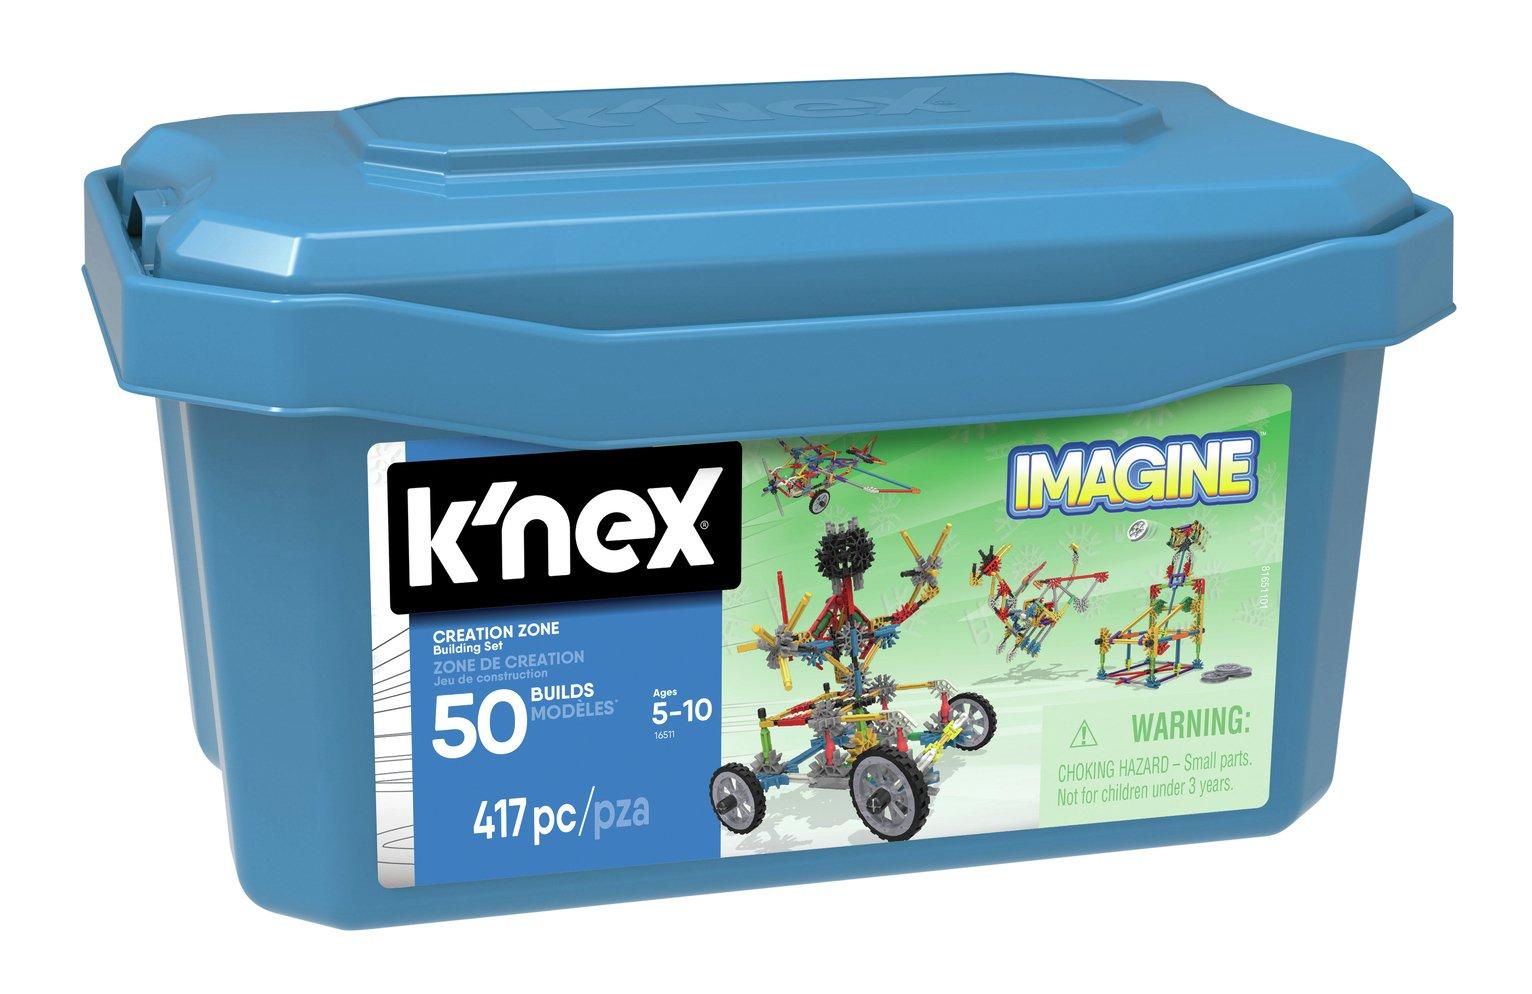 K'NEX Imagine Creation Zone 50 Model Building Set